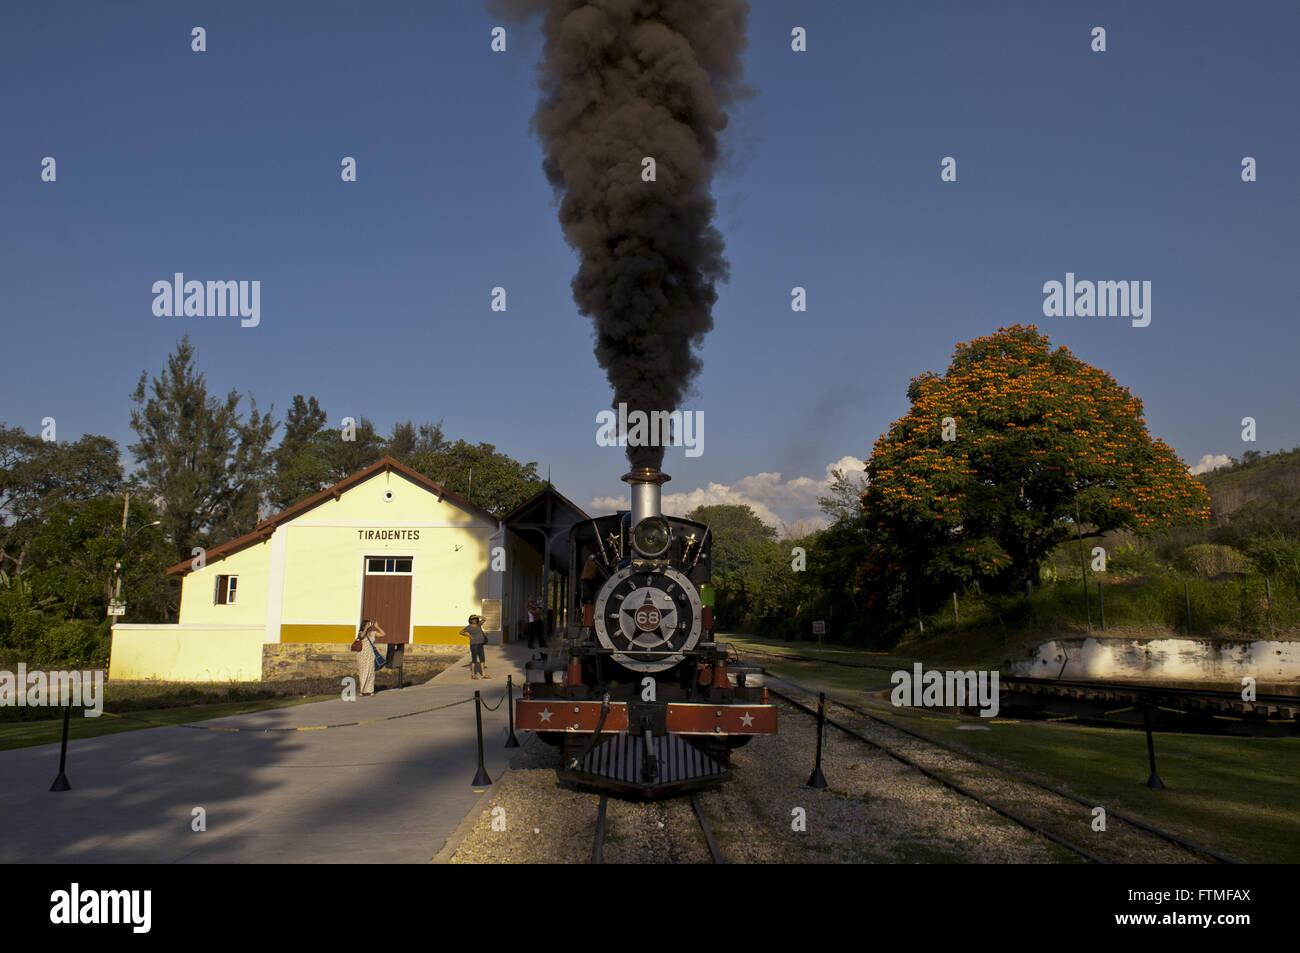 Maria-smoke in season daEstrada of West Iron Mines built between 1880 and 1881 - Stock Image